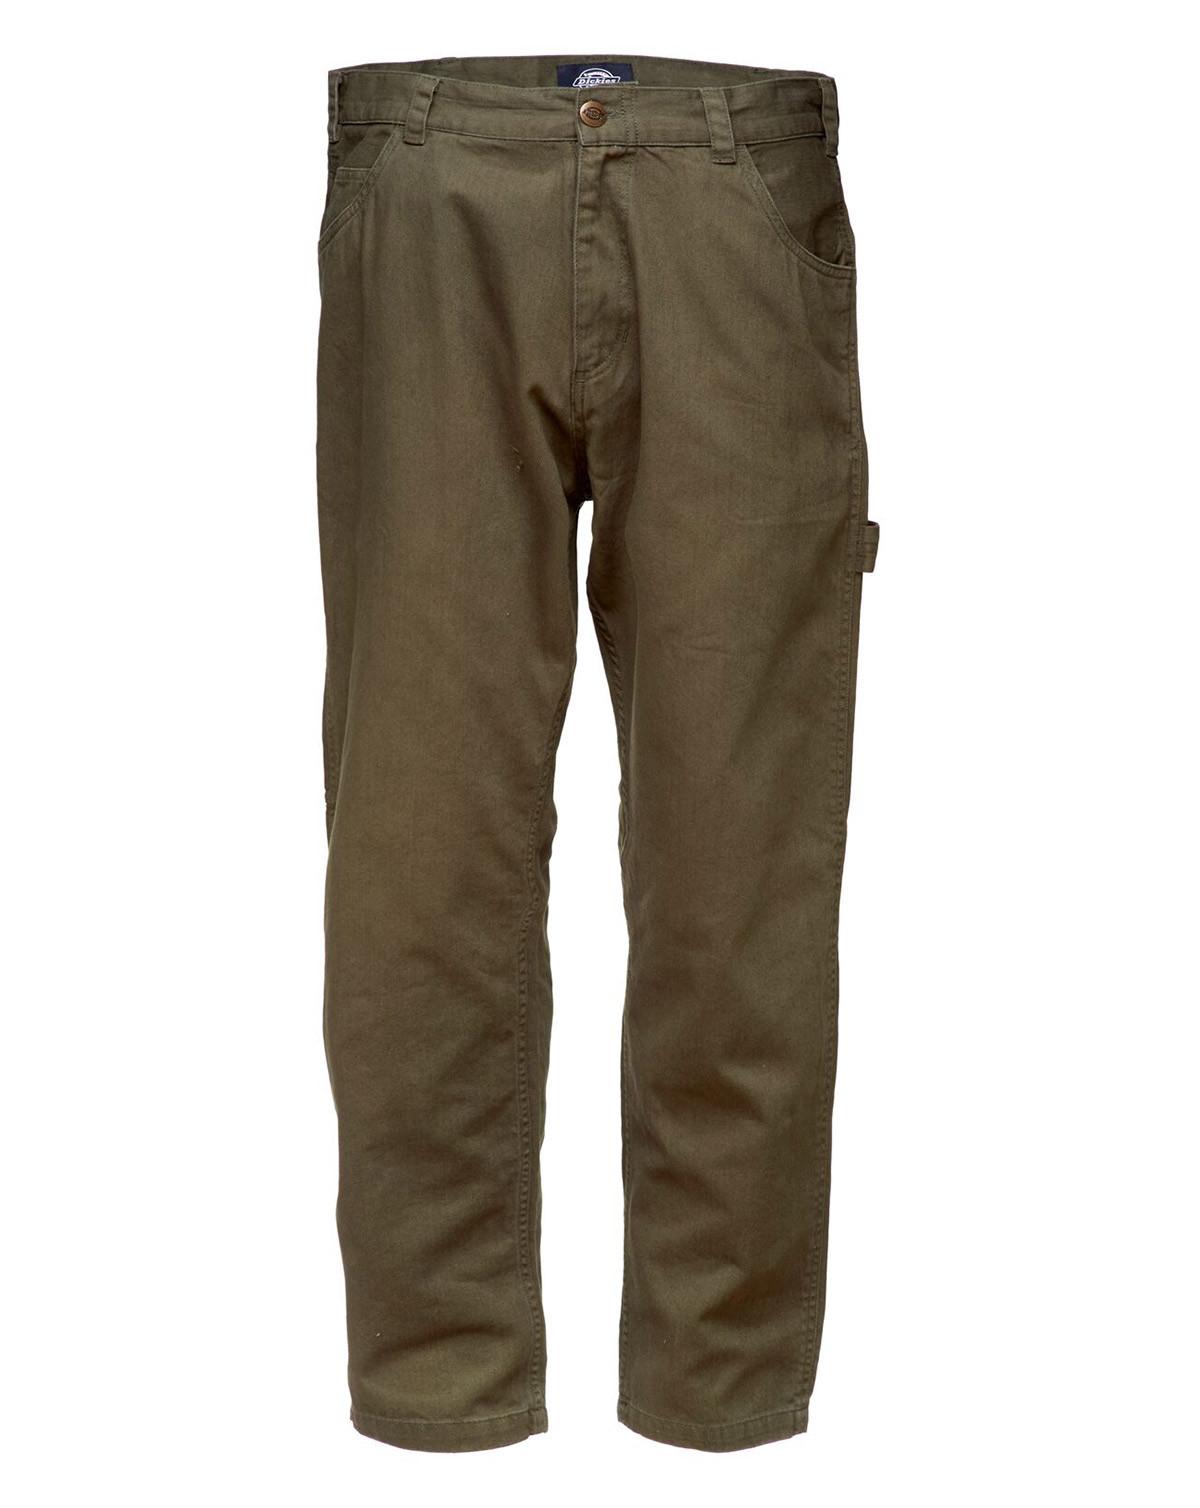 Dickies Fairdale Carpenter Pant (Dark Olive, W40 / L34)